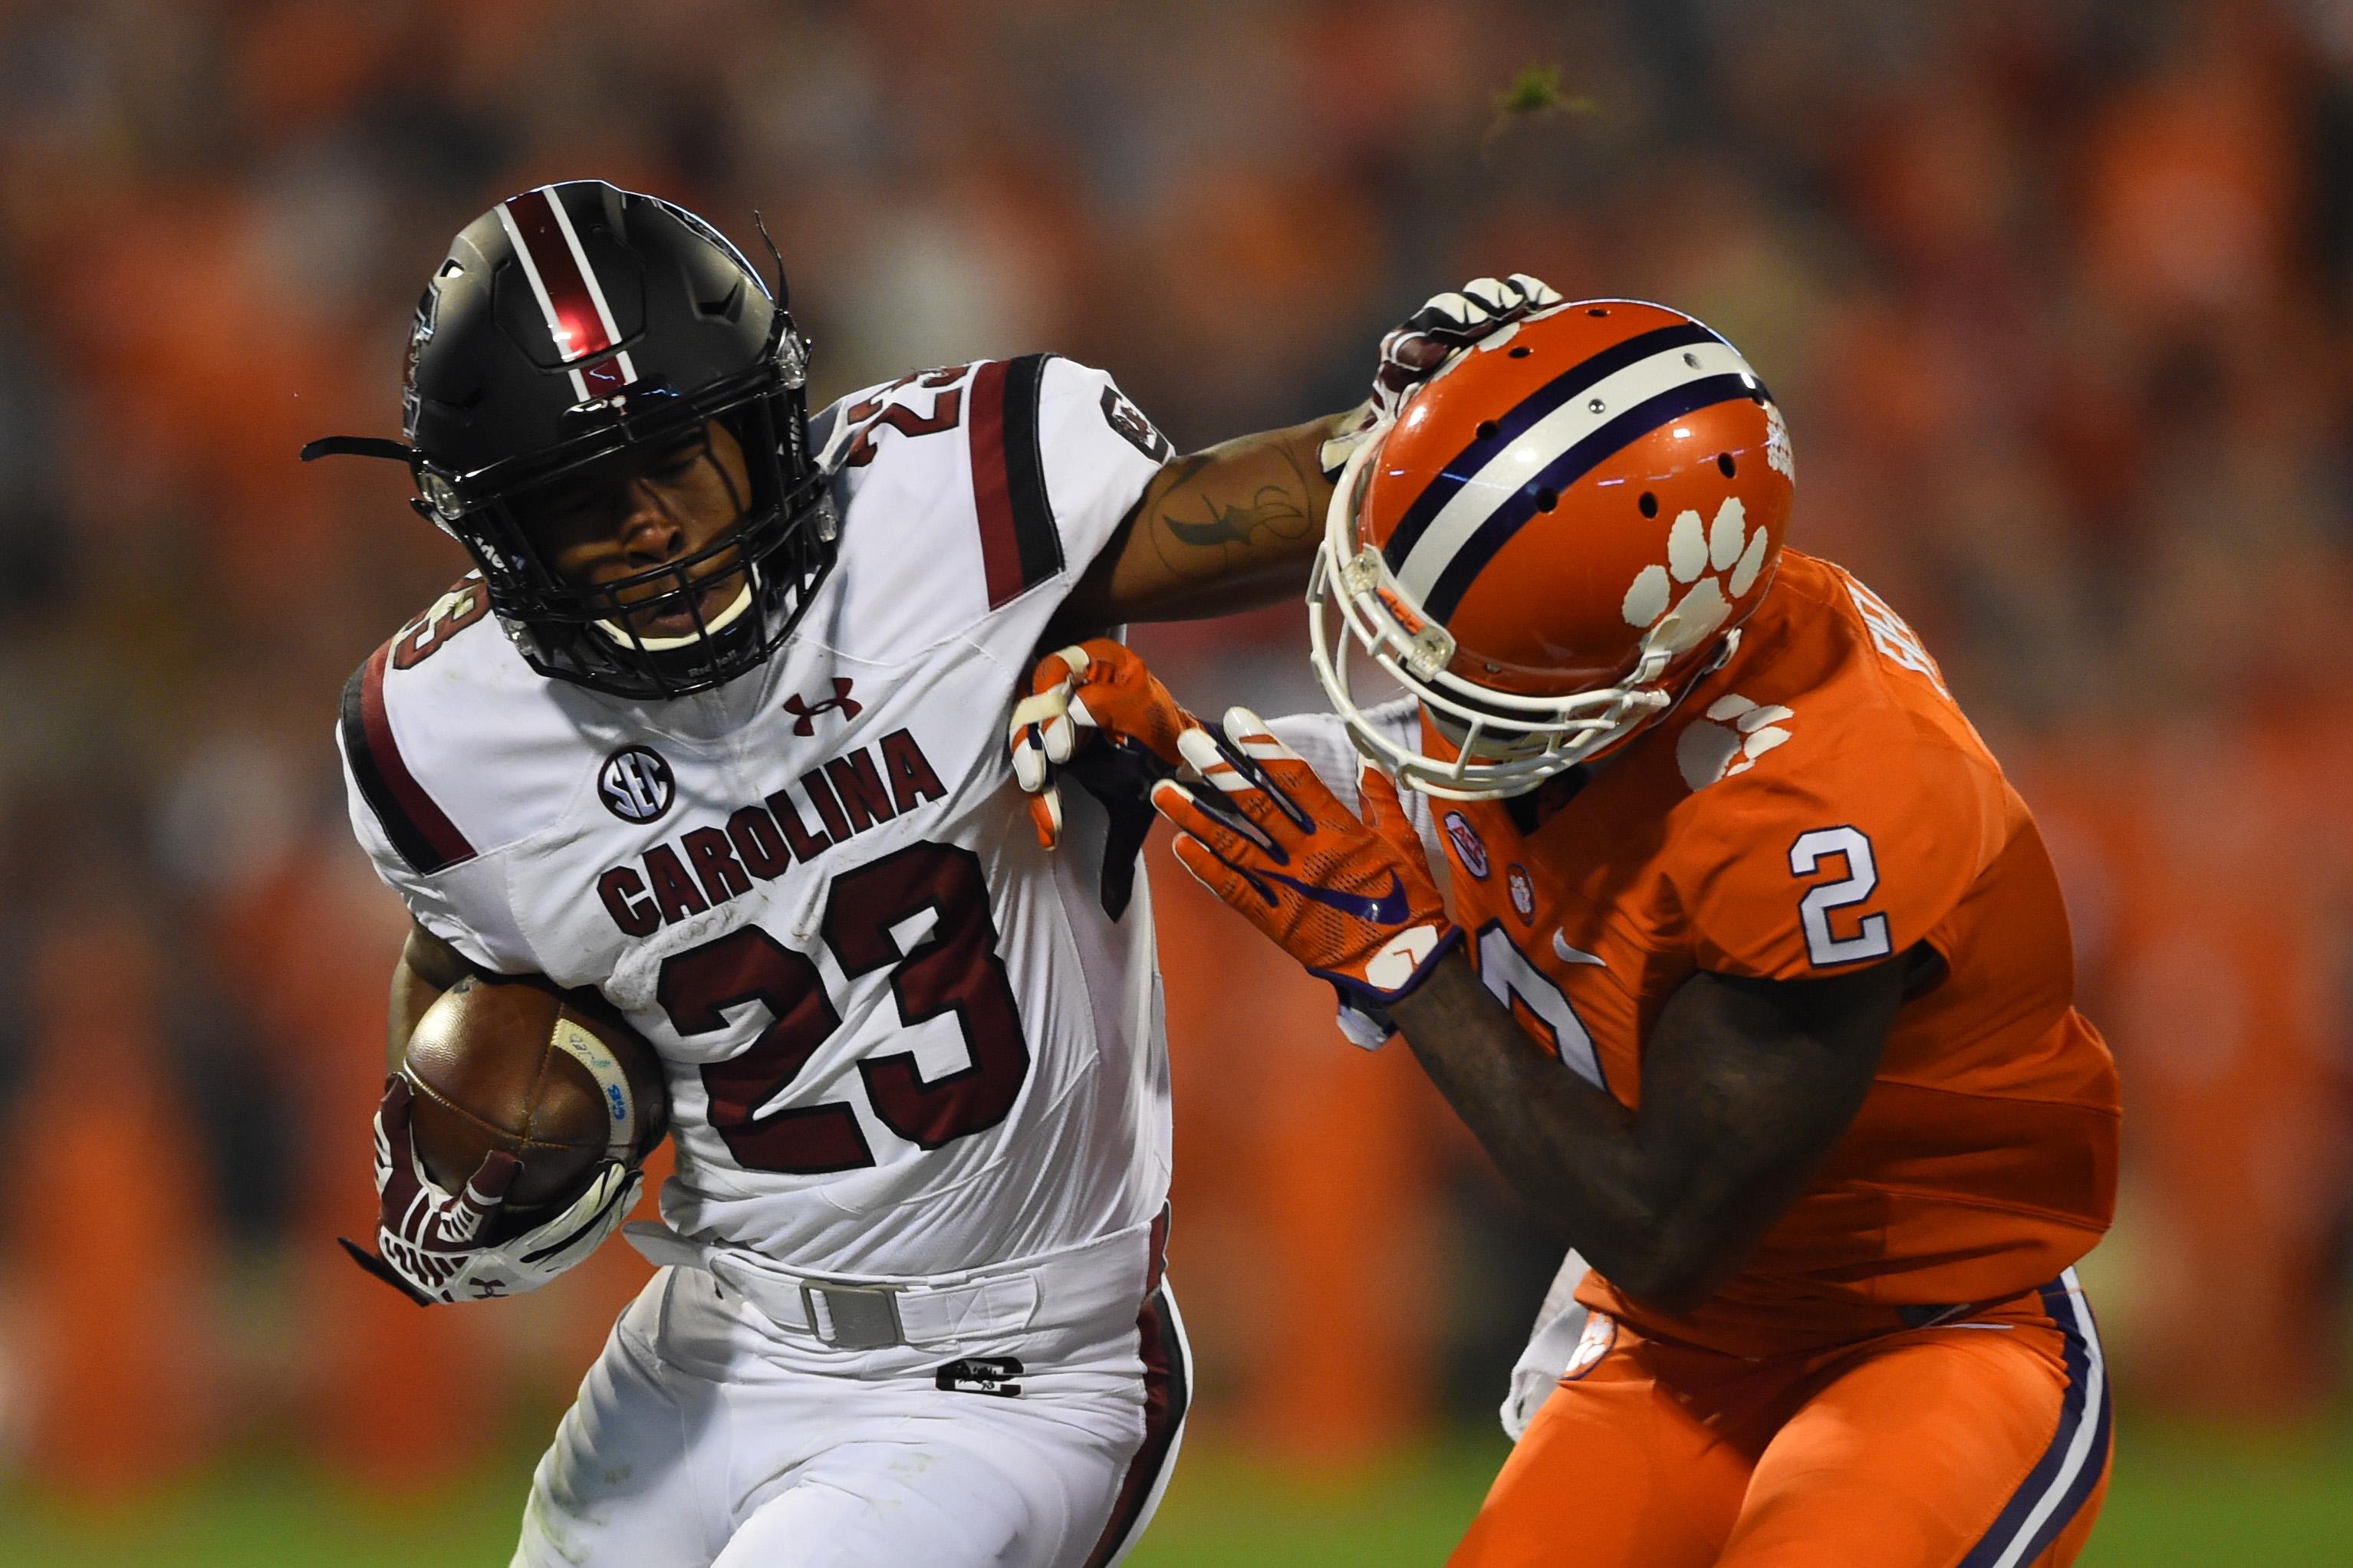 South Carolina vs. Clemson football: 10 bold predictions